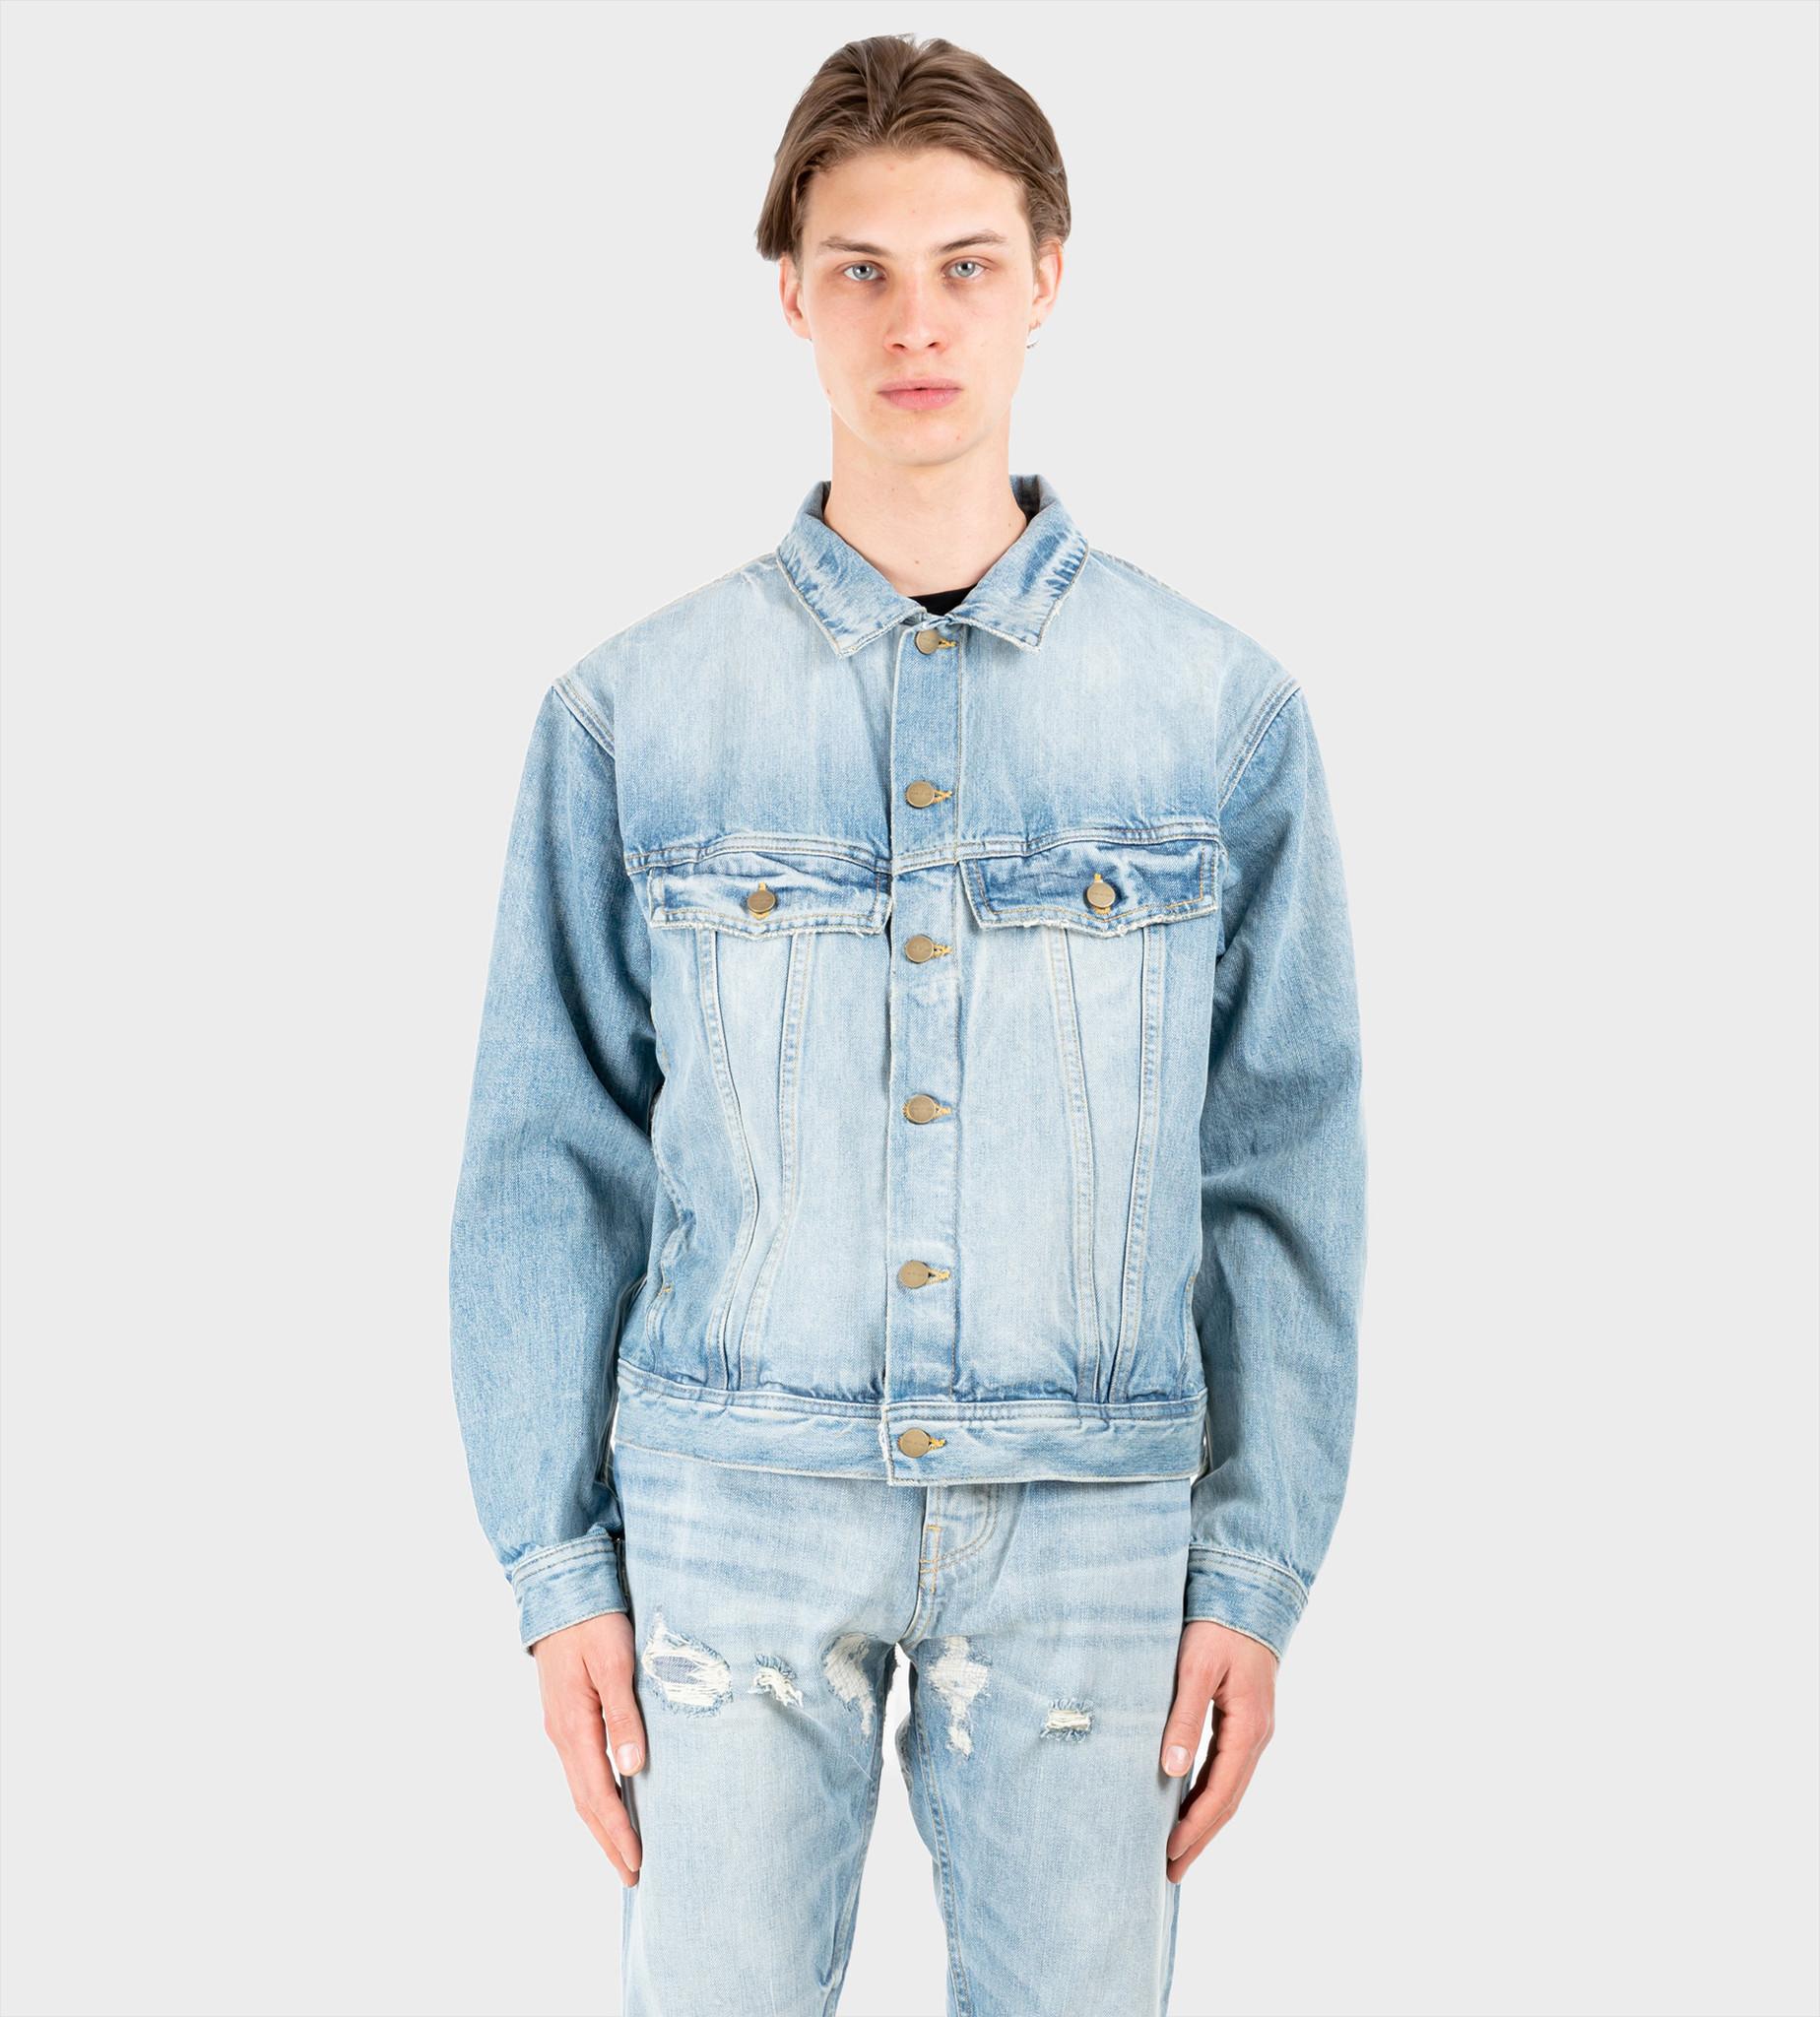 FEAR OF GOD Denim Jacket Blue